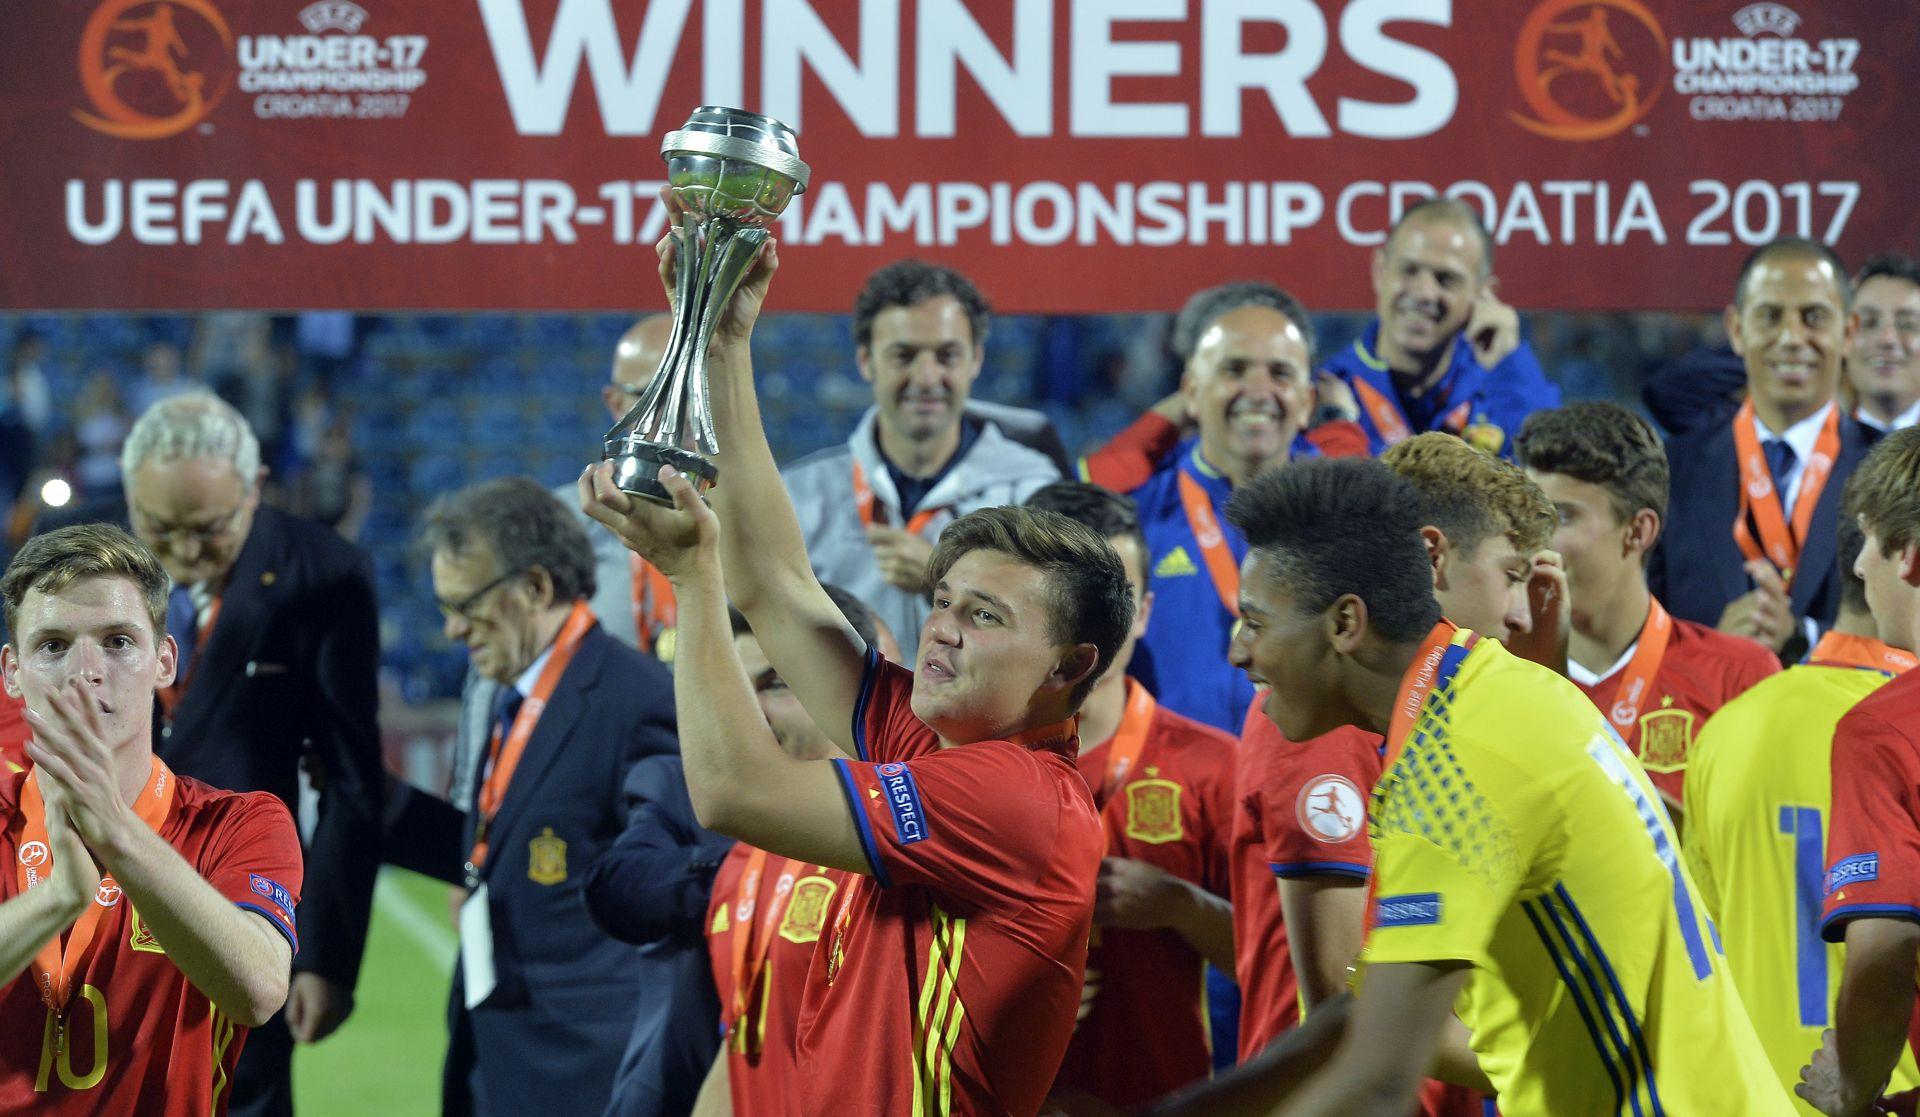 EP U-17 Španjolci osvojili treći uzastopni naslov prvaka